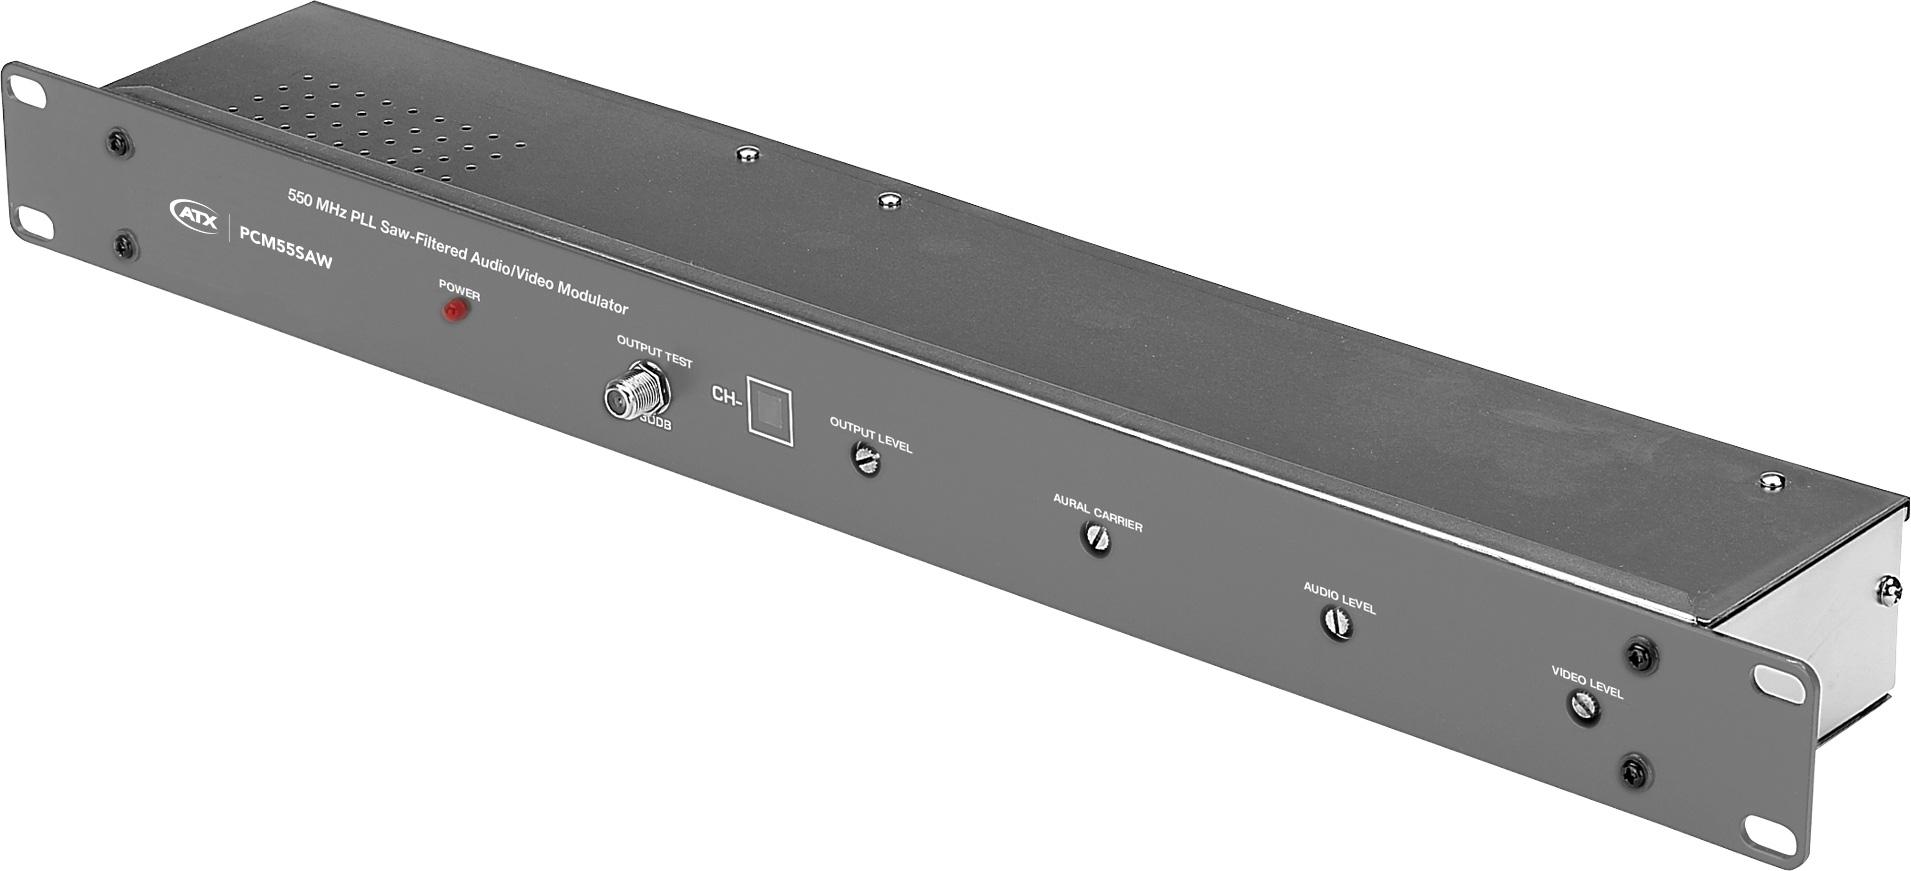 1 Channel Crystal A/V Modulator - Channel 8 PM-PCM55SAW-8